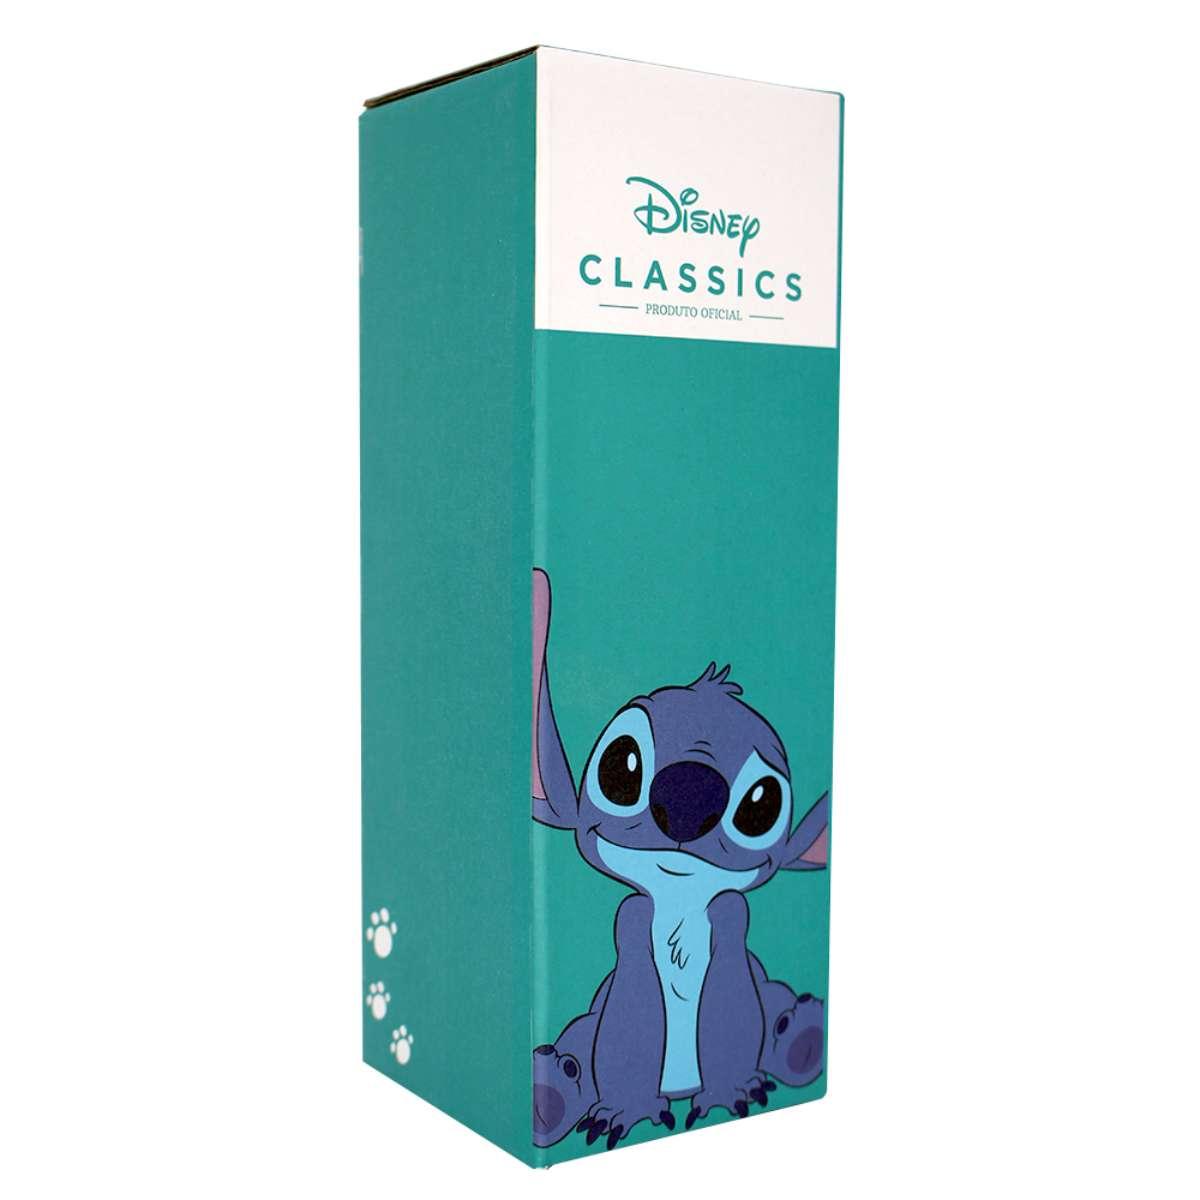 Garrafa de Vidro Coala Stitch Amigo Disney Eco